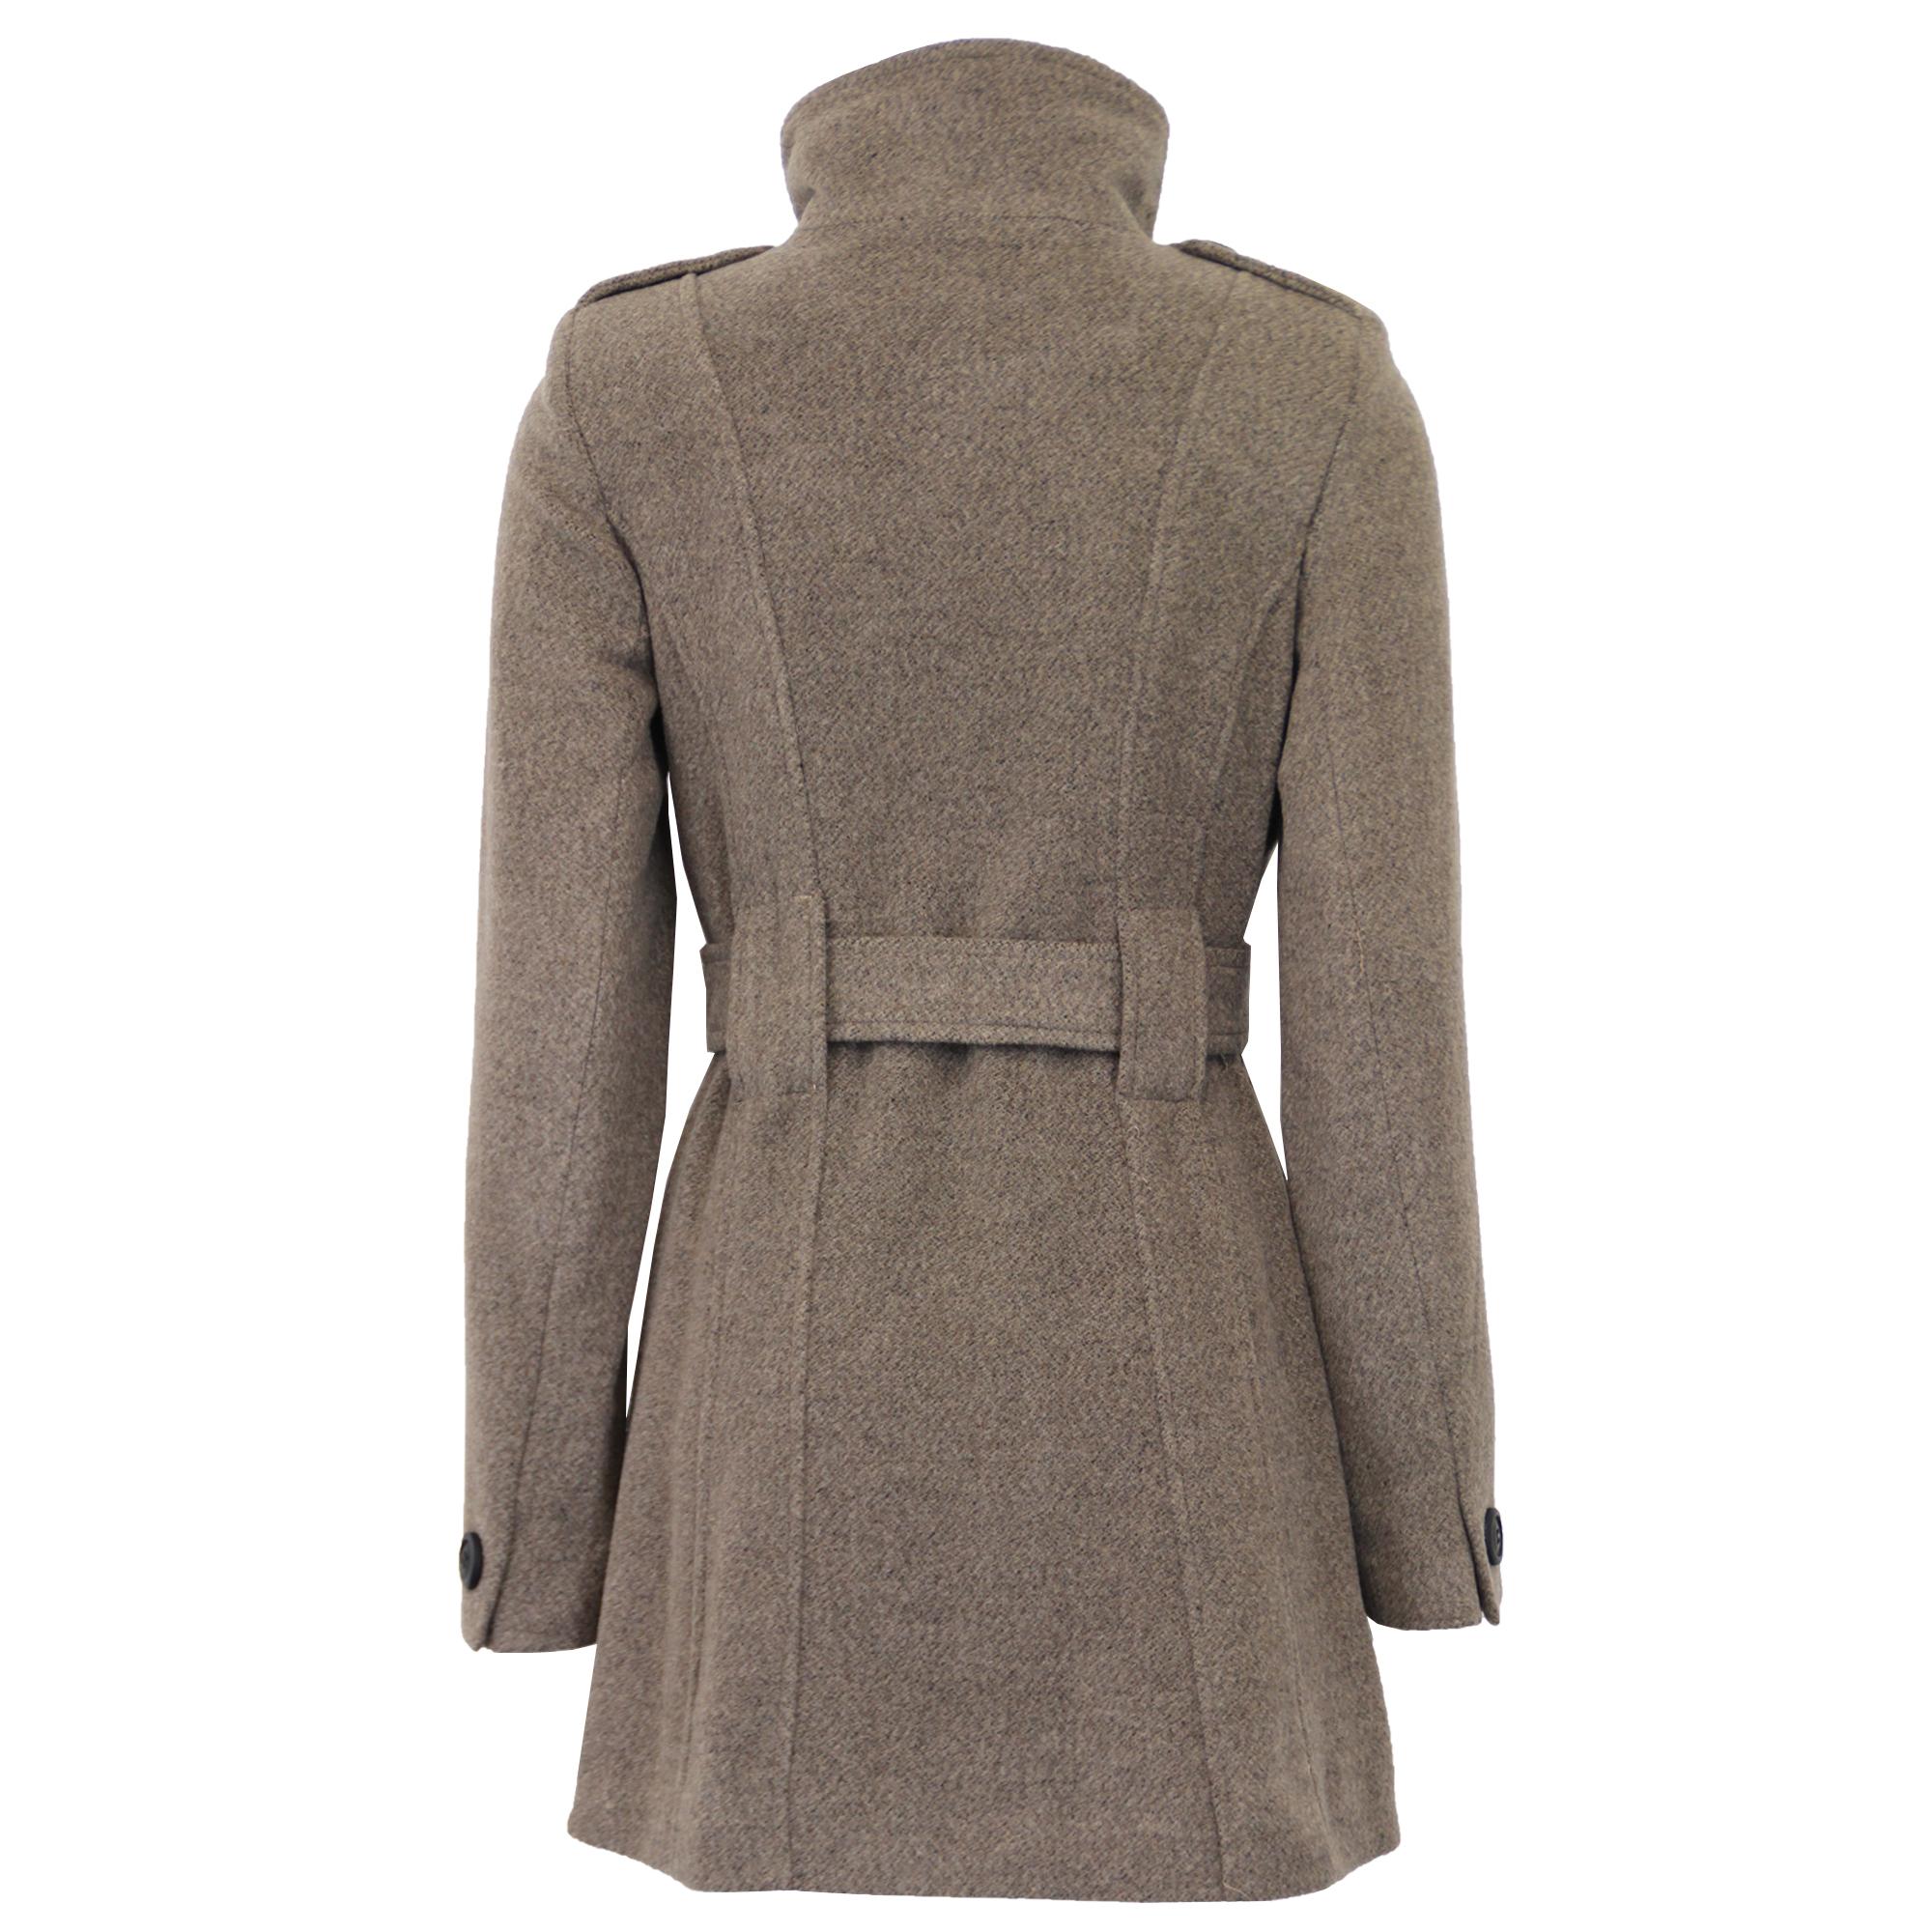 Ladies Wool Coat Womens Jacket Double Breasted Belt ...